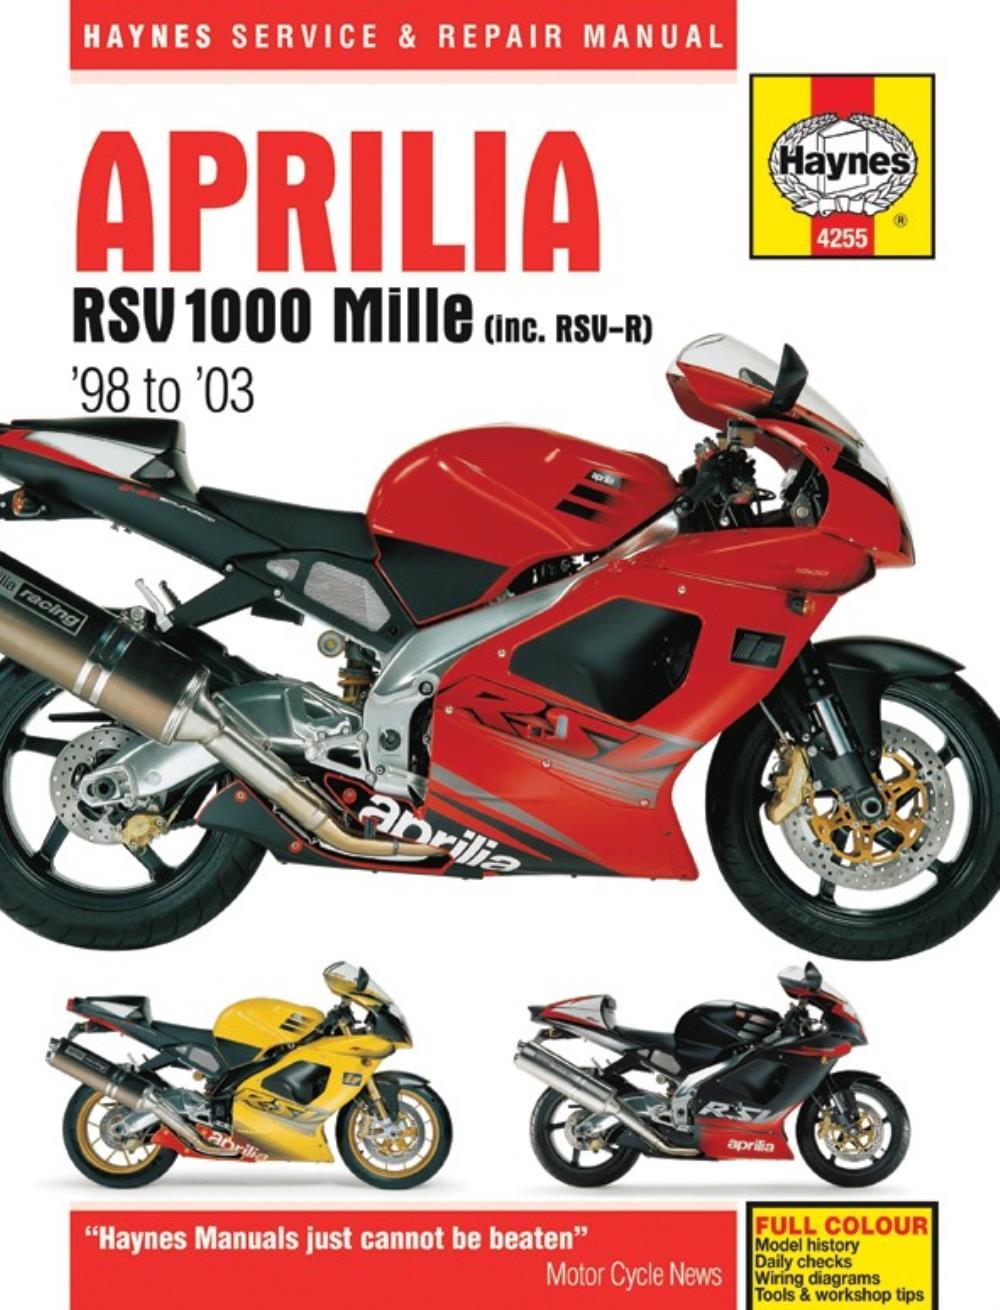 Image is loading Manual-Haynes-for-2002-Aprilia-RSV-1000